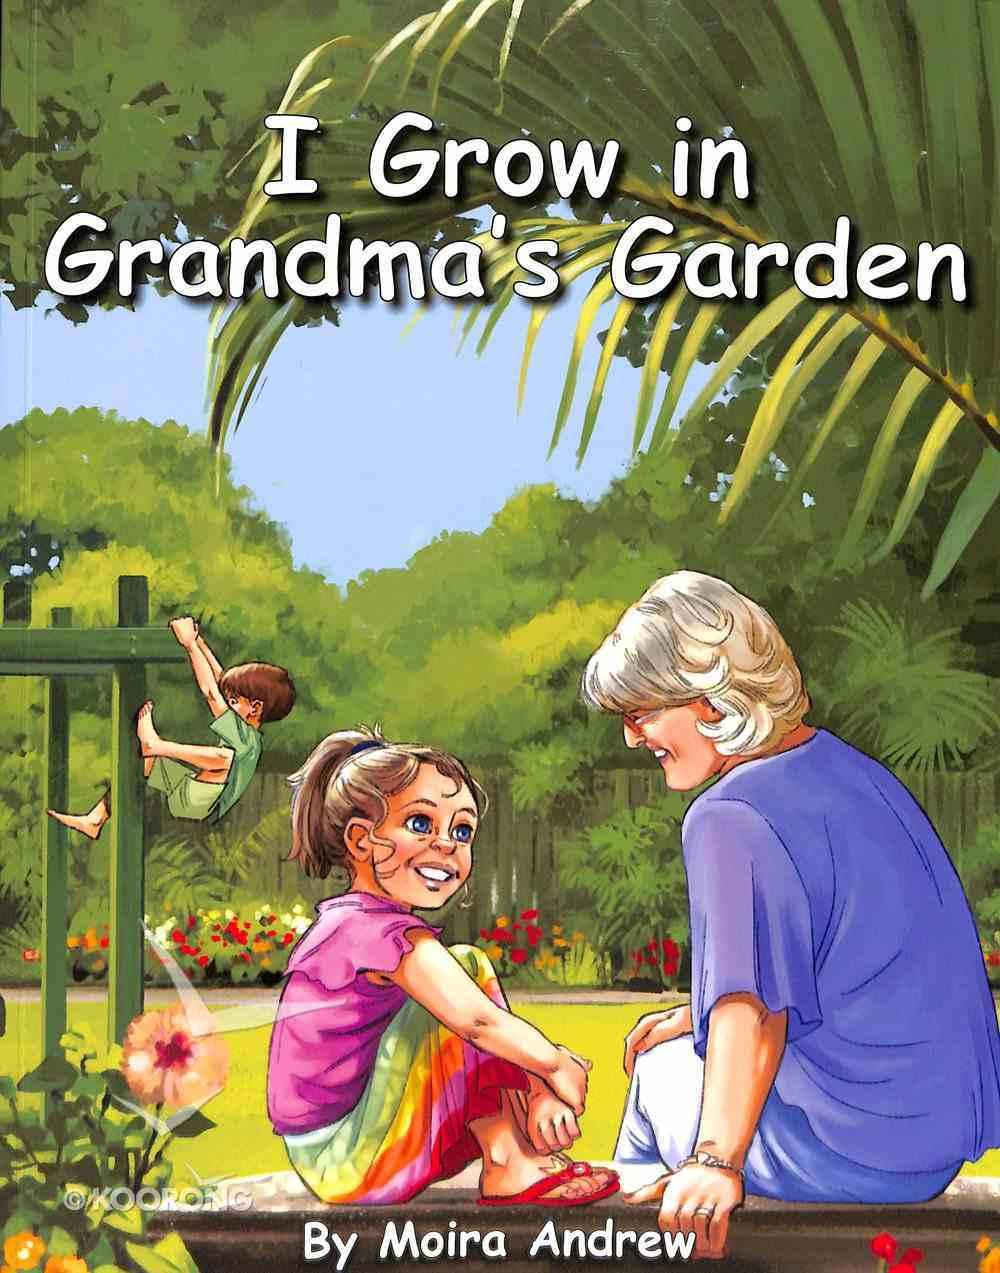 I Grow in Grandma's Garden Paperback